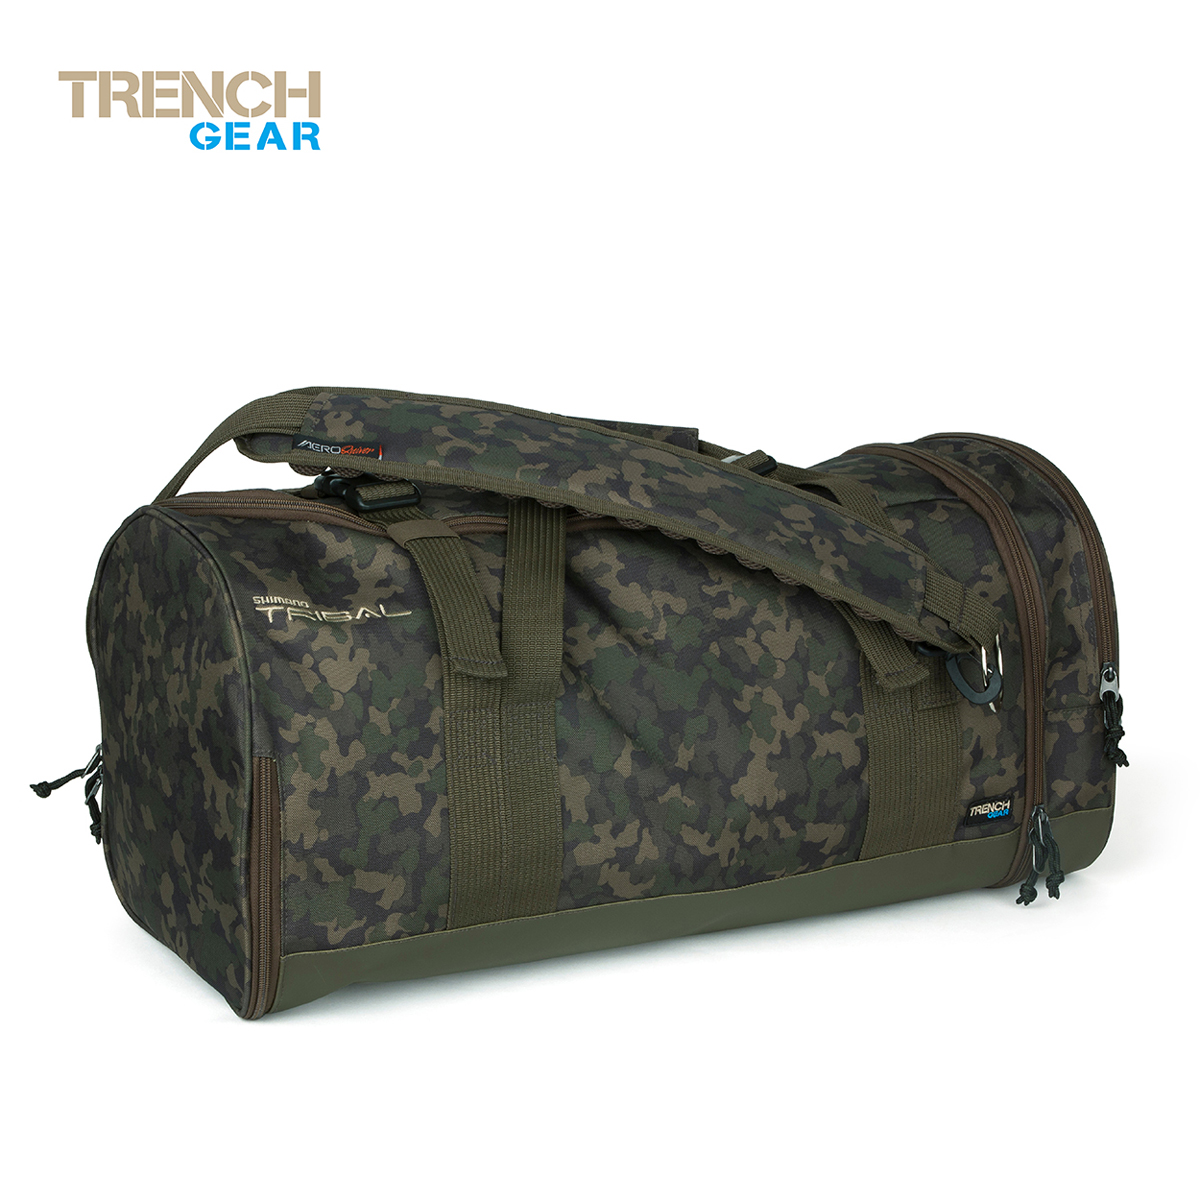 Shimano Trench Clothing Bag Incl. Aero Qvr Strap Advanced